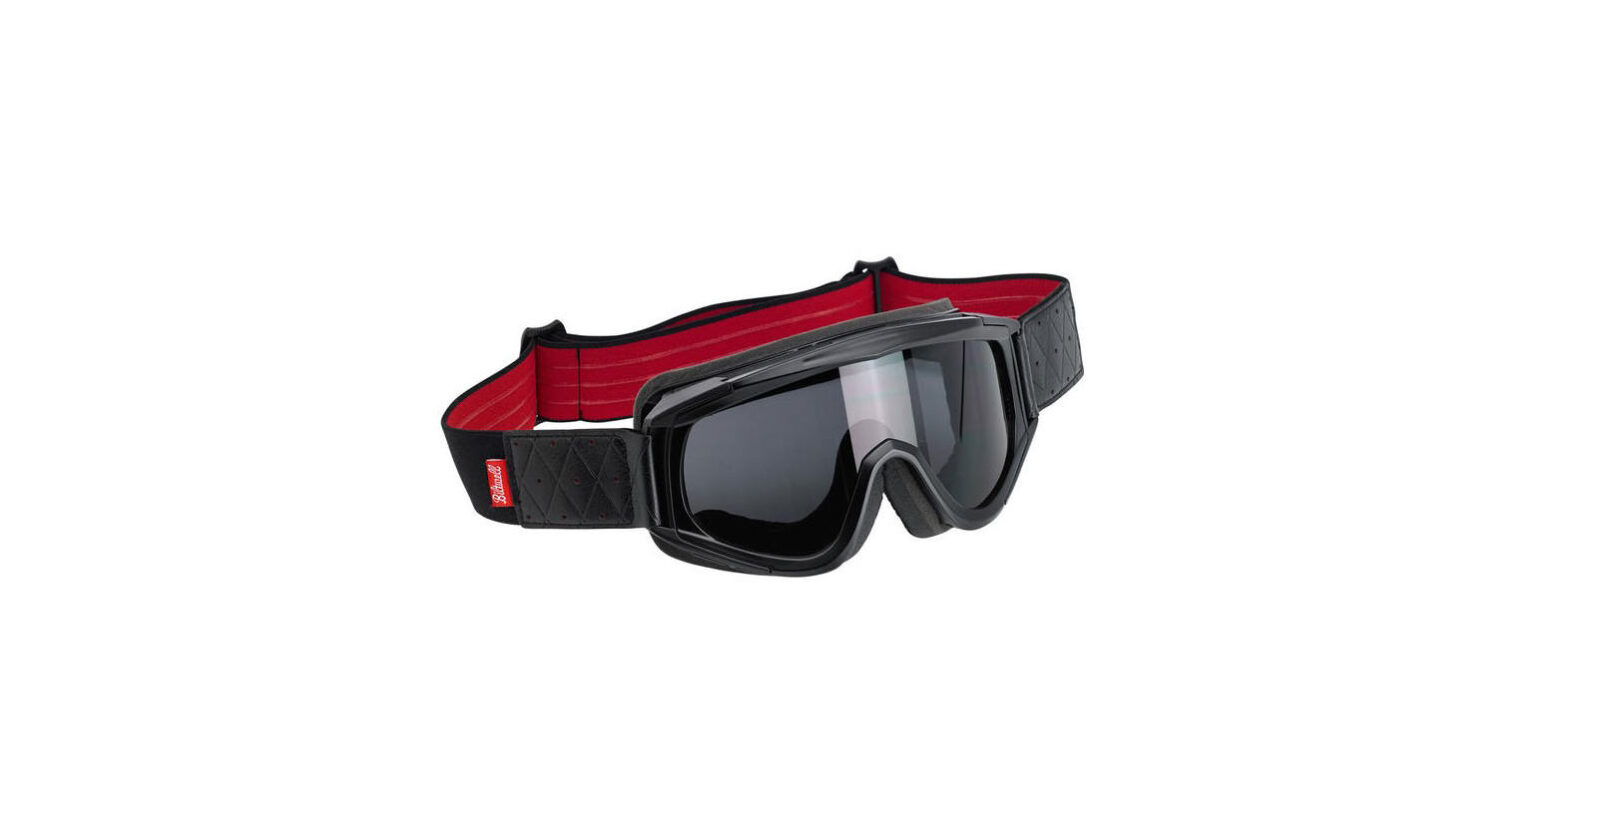 Biltwell Overland Goggles 1600x836 - Biltwell Overland Goggles